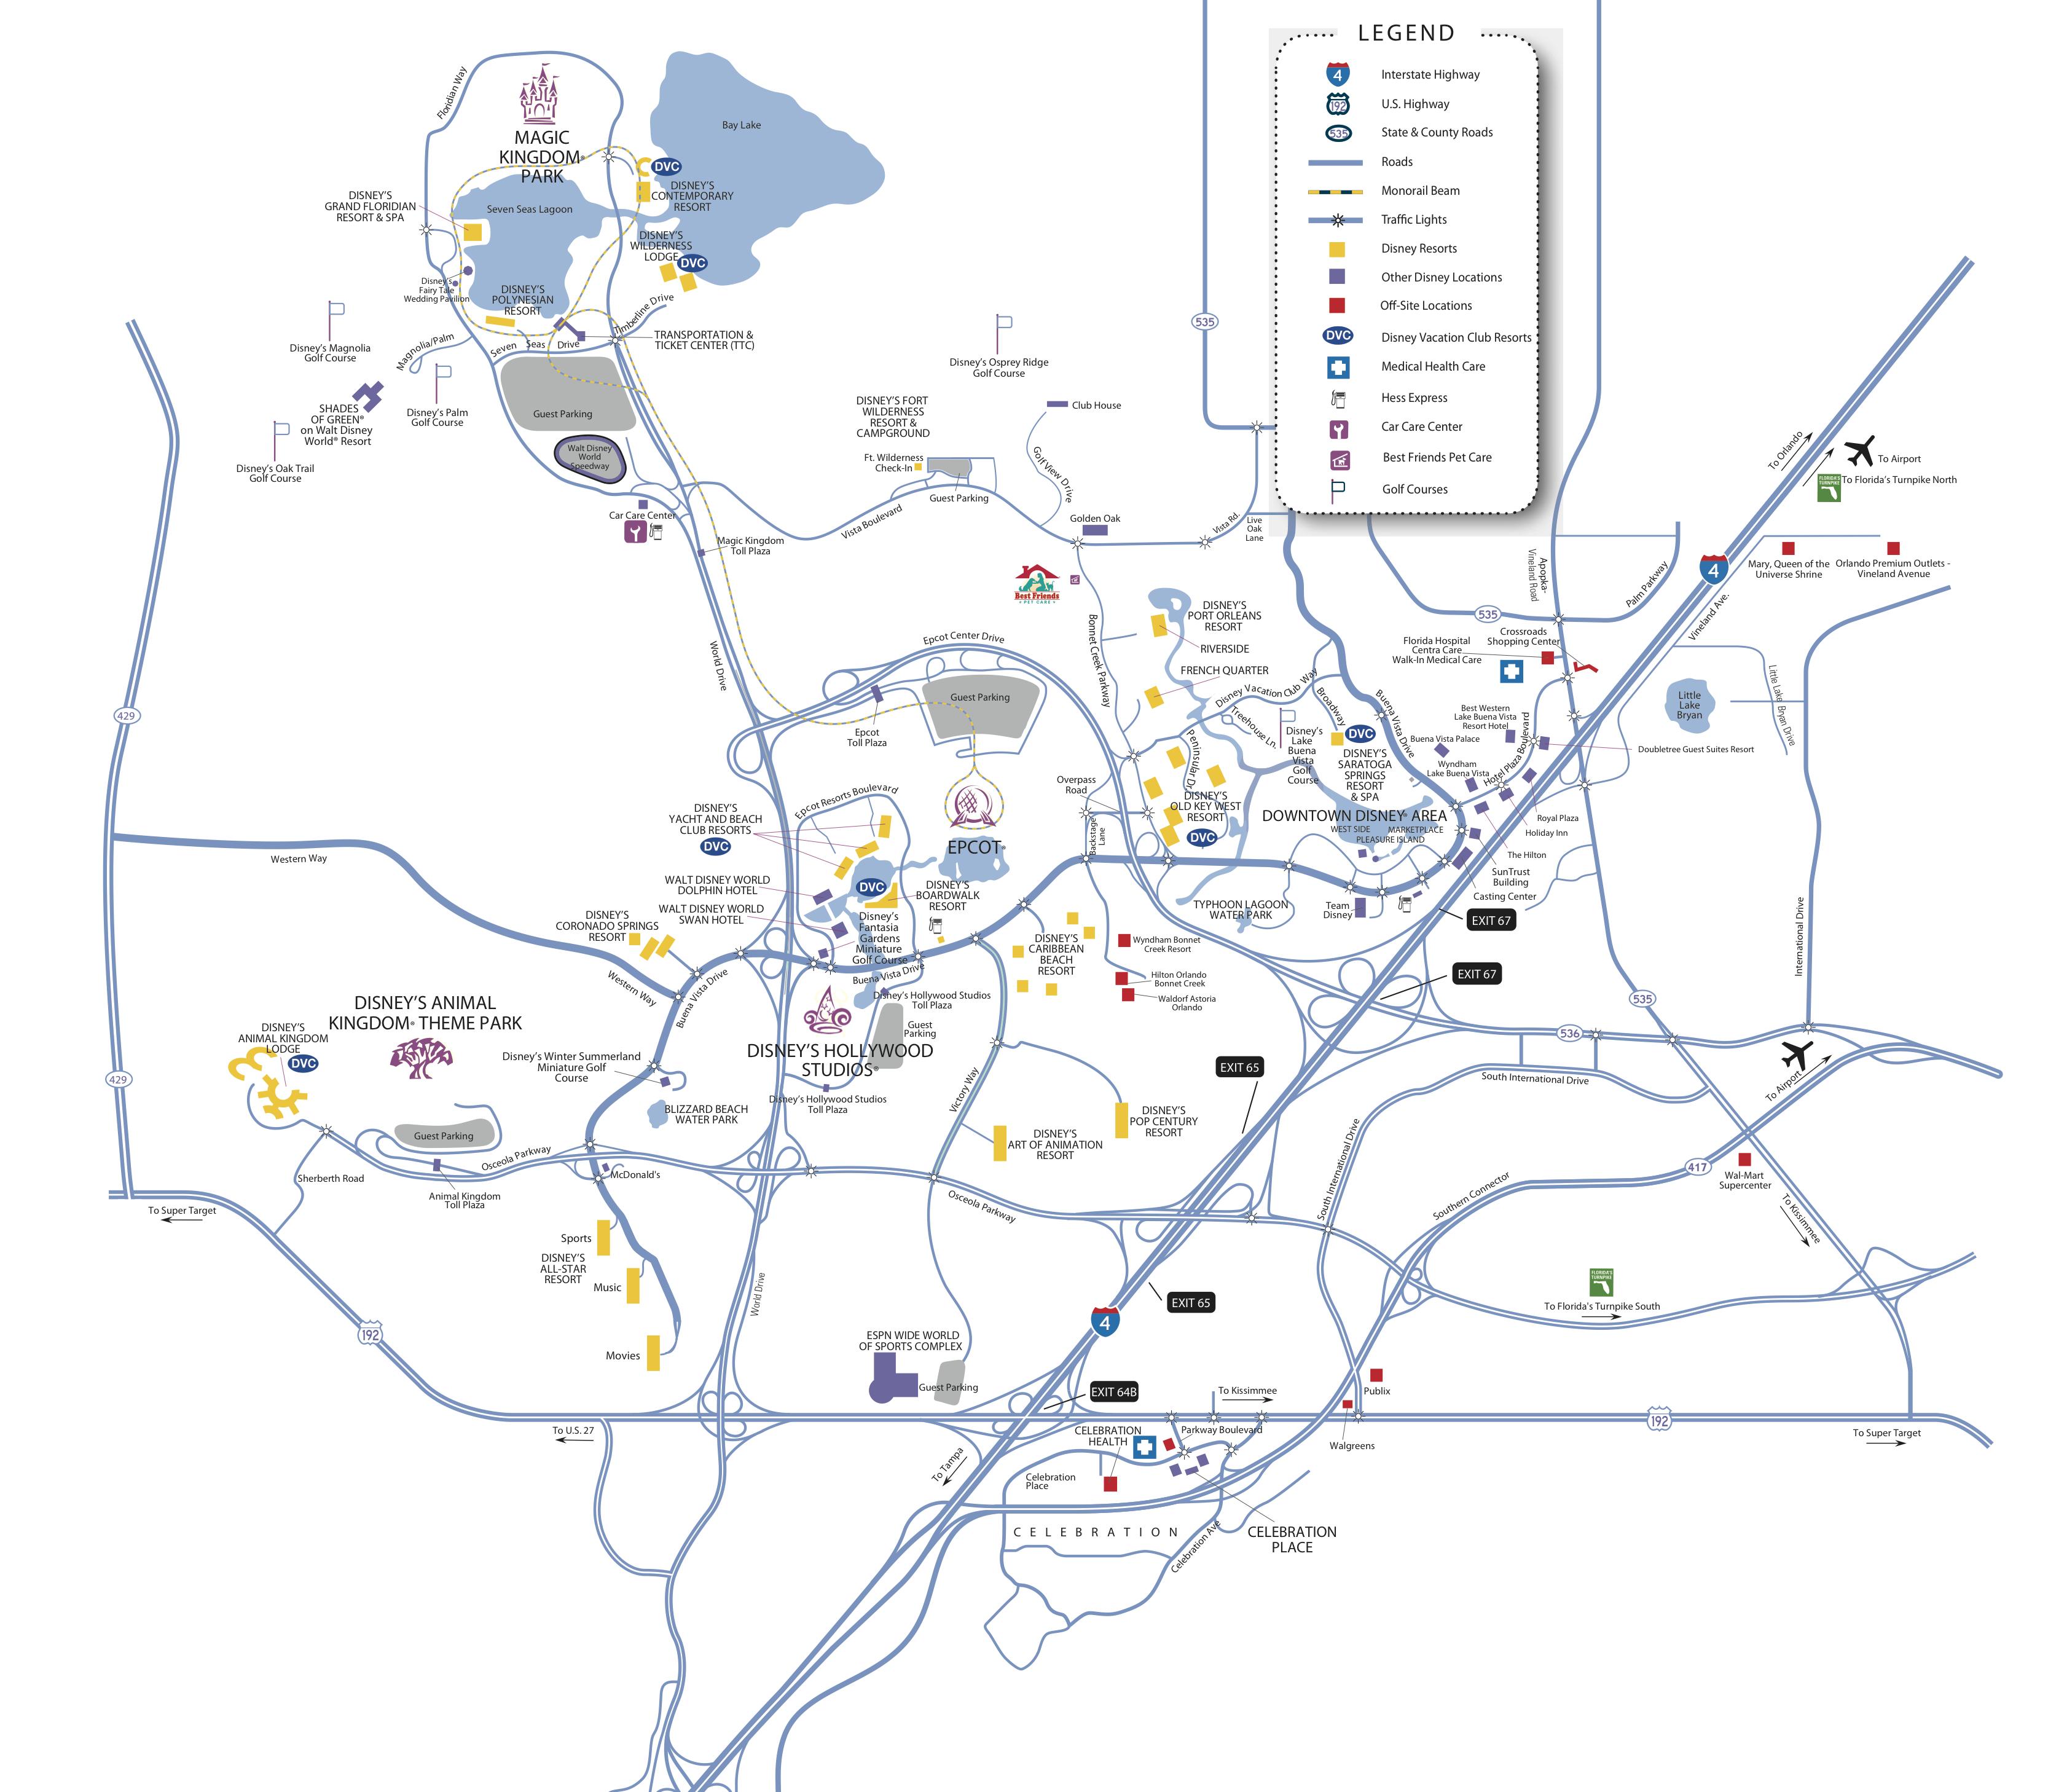 Walt Disney World Map With Hotels.Disney World Map Bferryhomes Com And 1031orlando Com